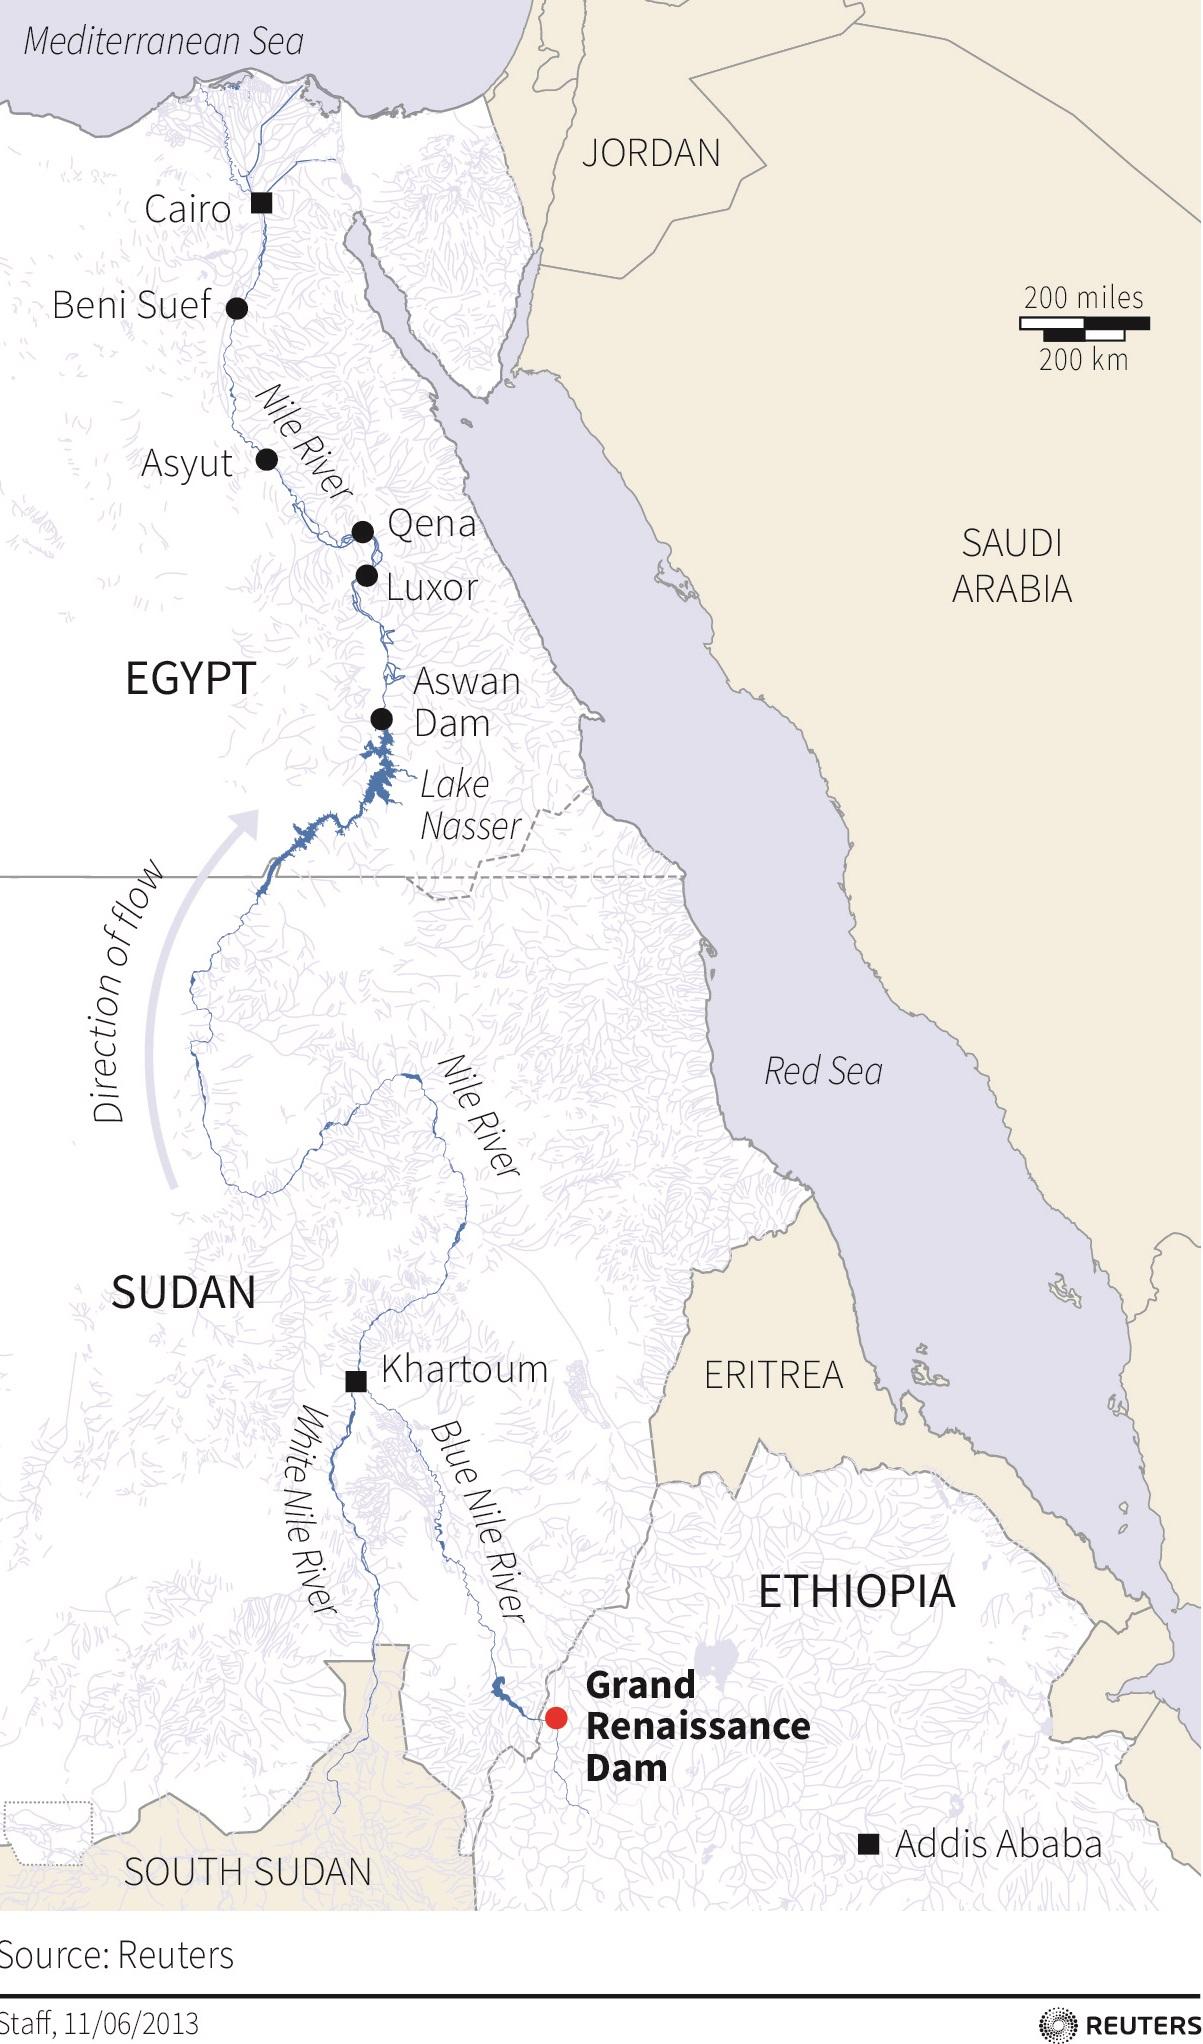 Grand Ethopia Renaissance Dam Nile Map (cropped)